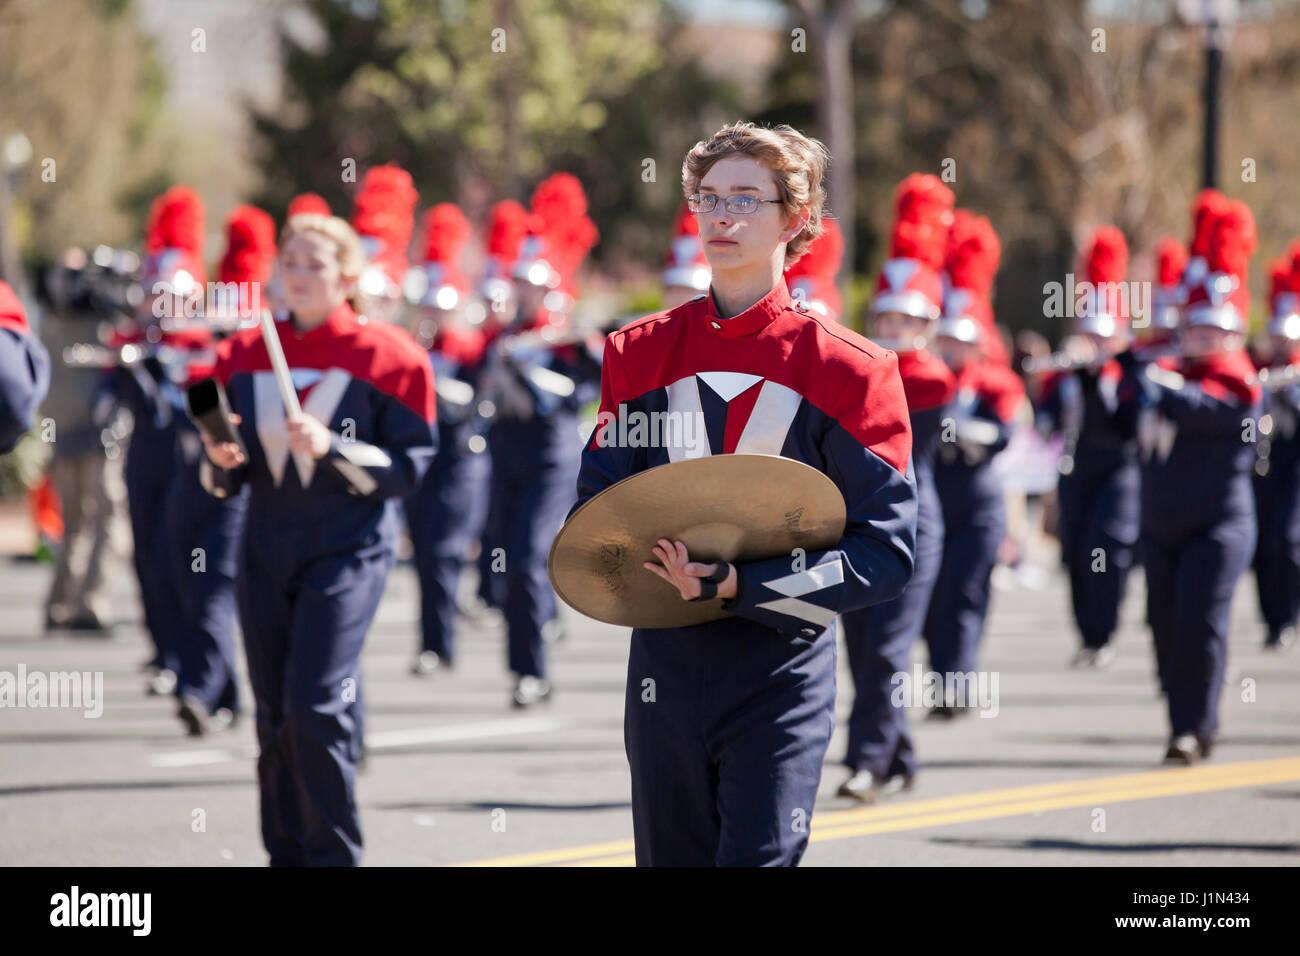 High school marching band di cembali player - USA Immagini Stock